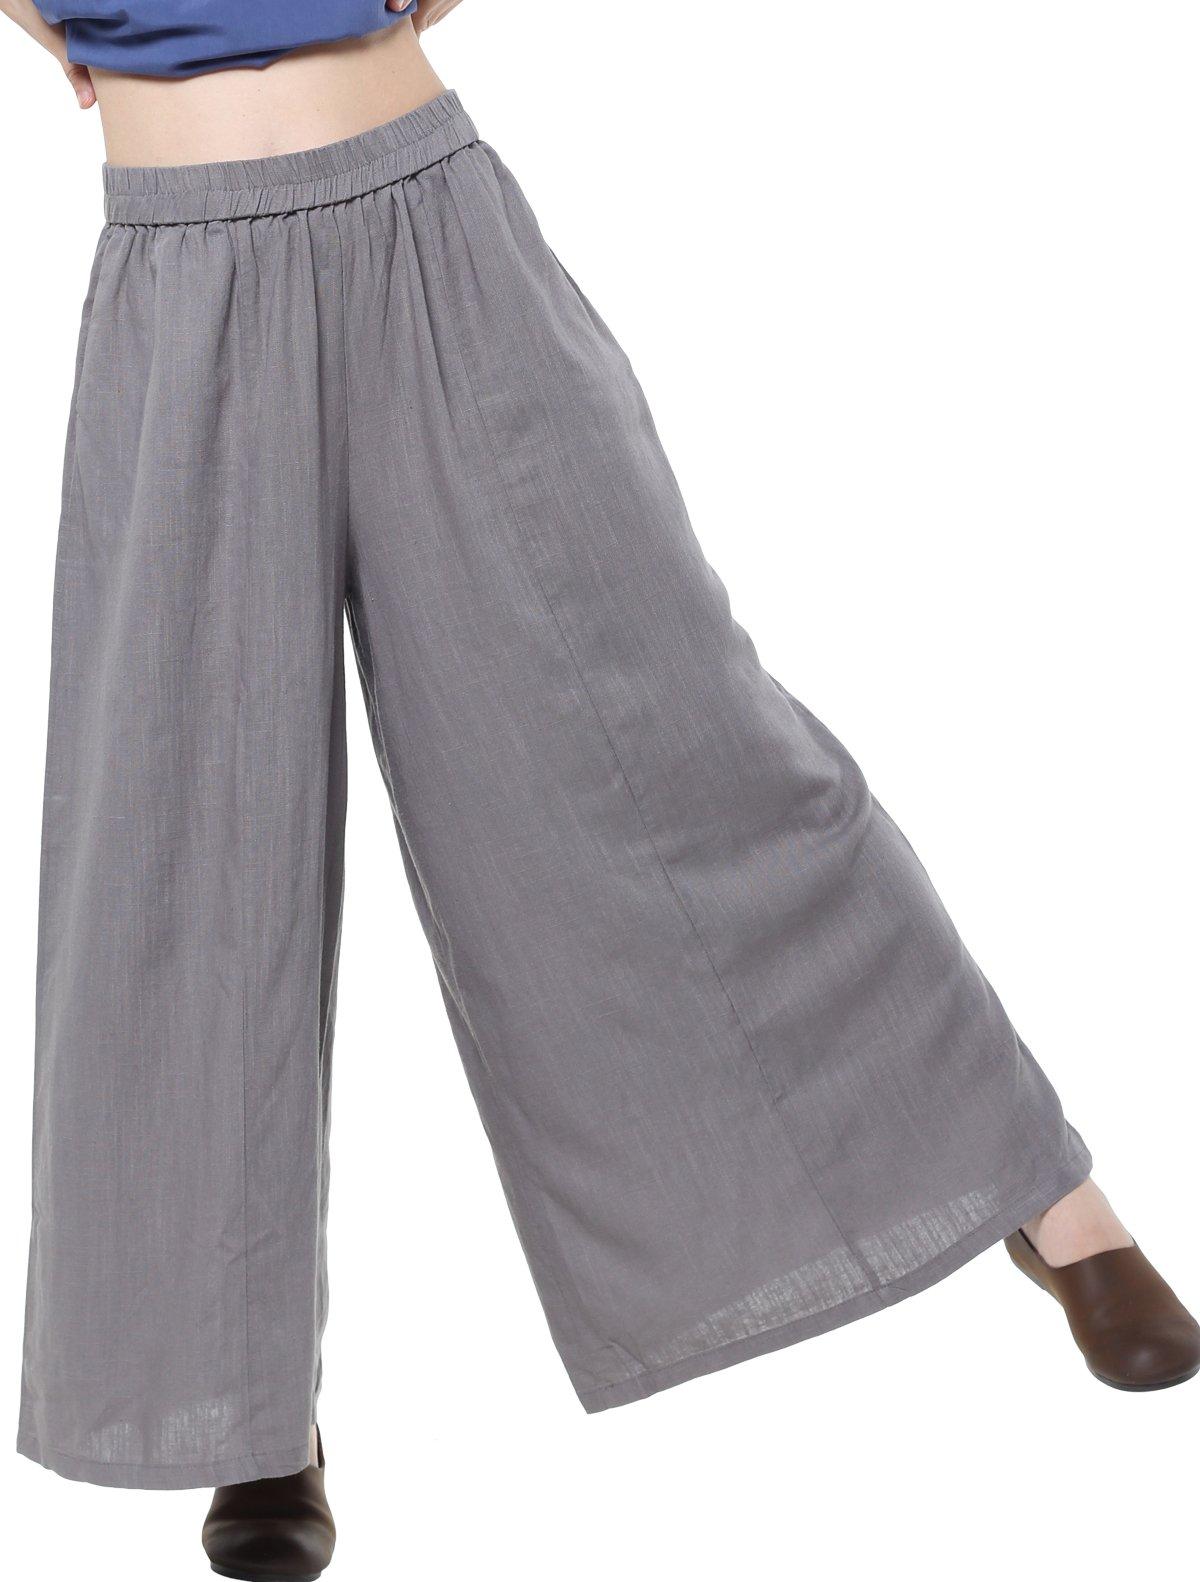 Mordenmiss Women's Linen Wide Leg Elastic Waistband Pants with Pockets (Medium, Gray)